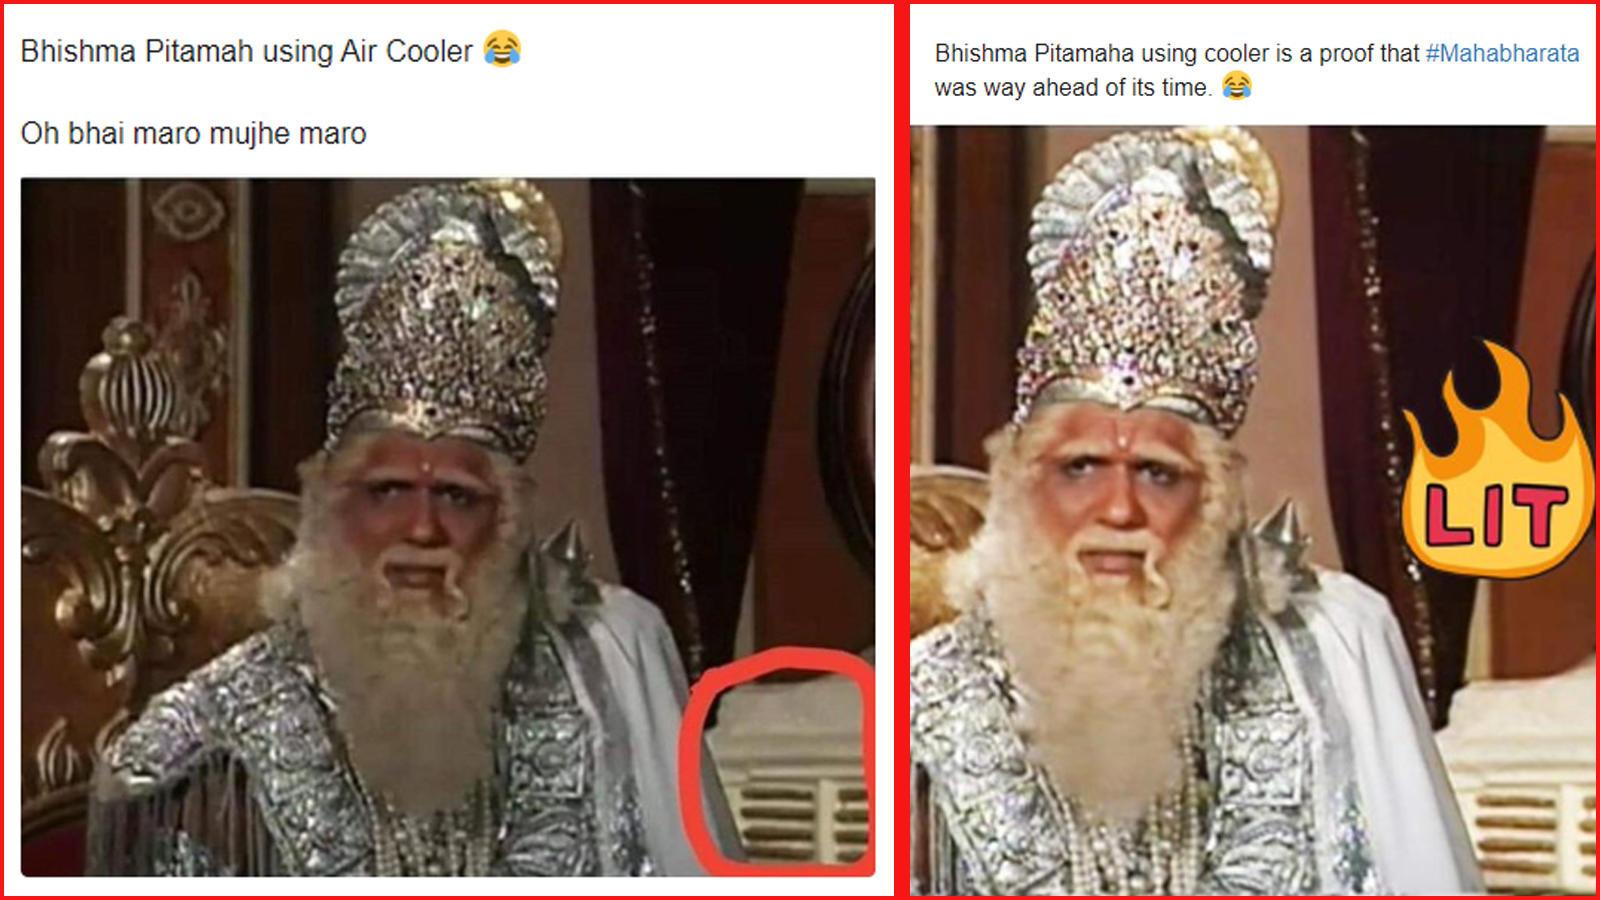 Fans Spot Cooler Behind Bhishma Pitamah Aka Mukesh Khanna In Mahabharat Hindi Movie News Bollywood Times Of India